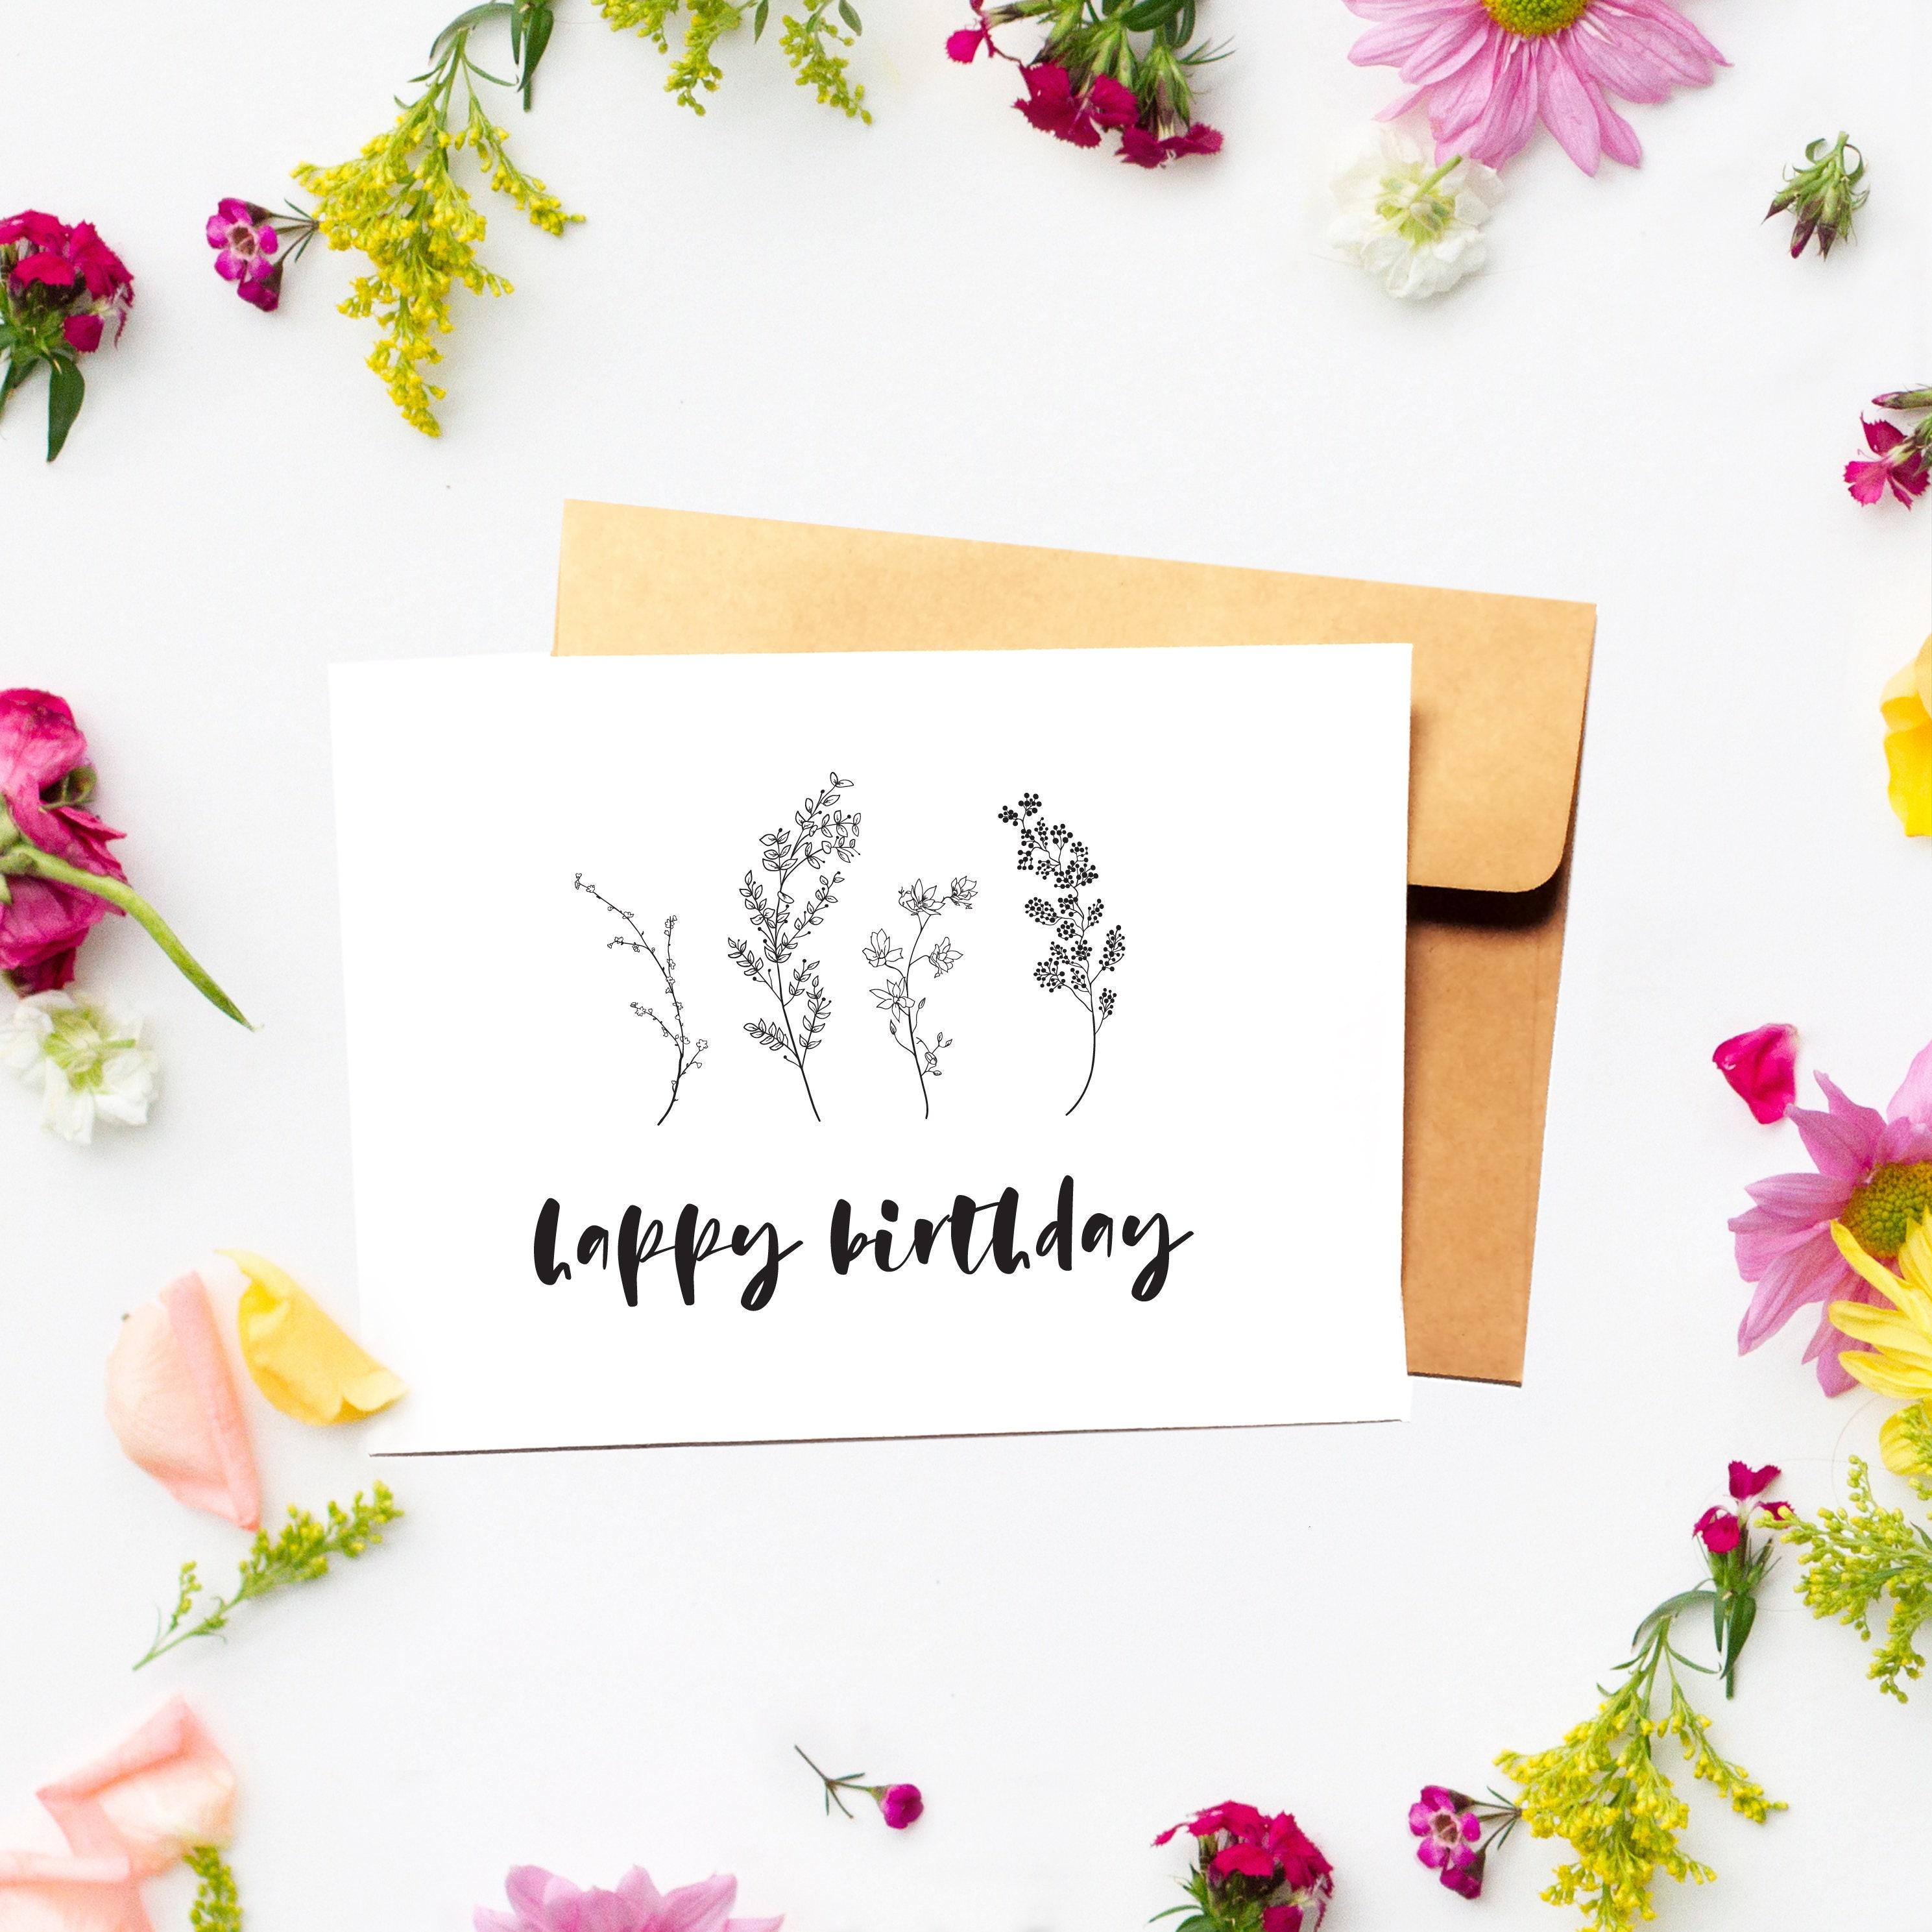 Birthday Cards Greetings Friend Gallery Free Birthday Cards